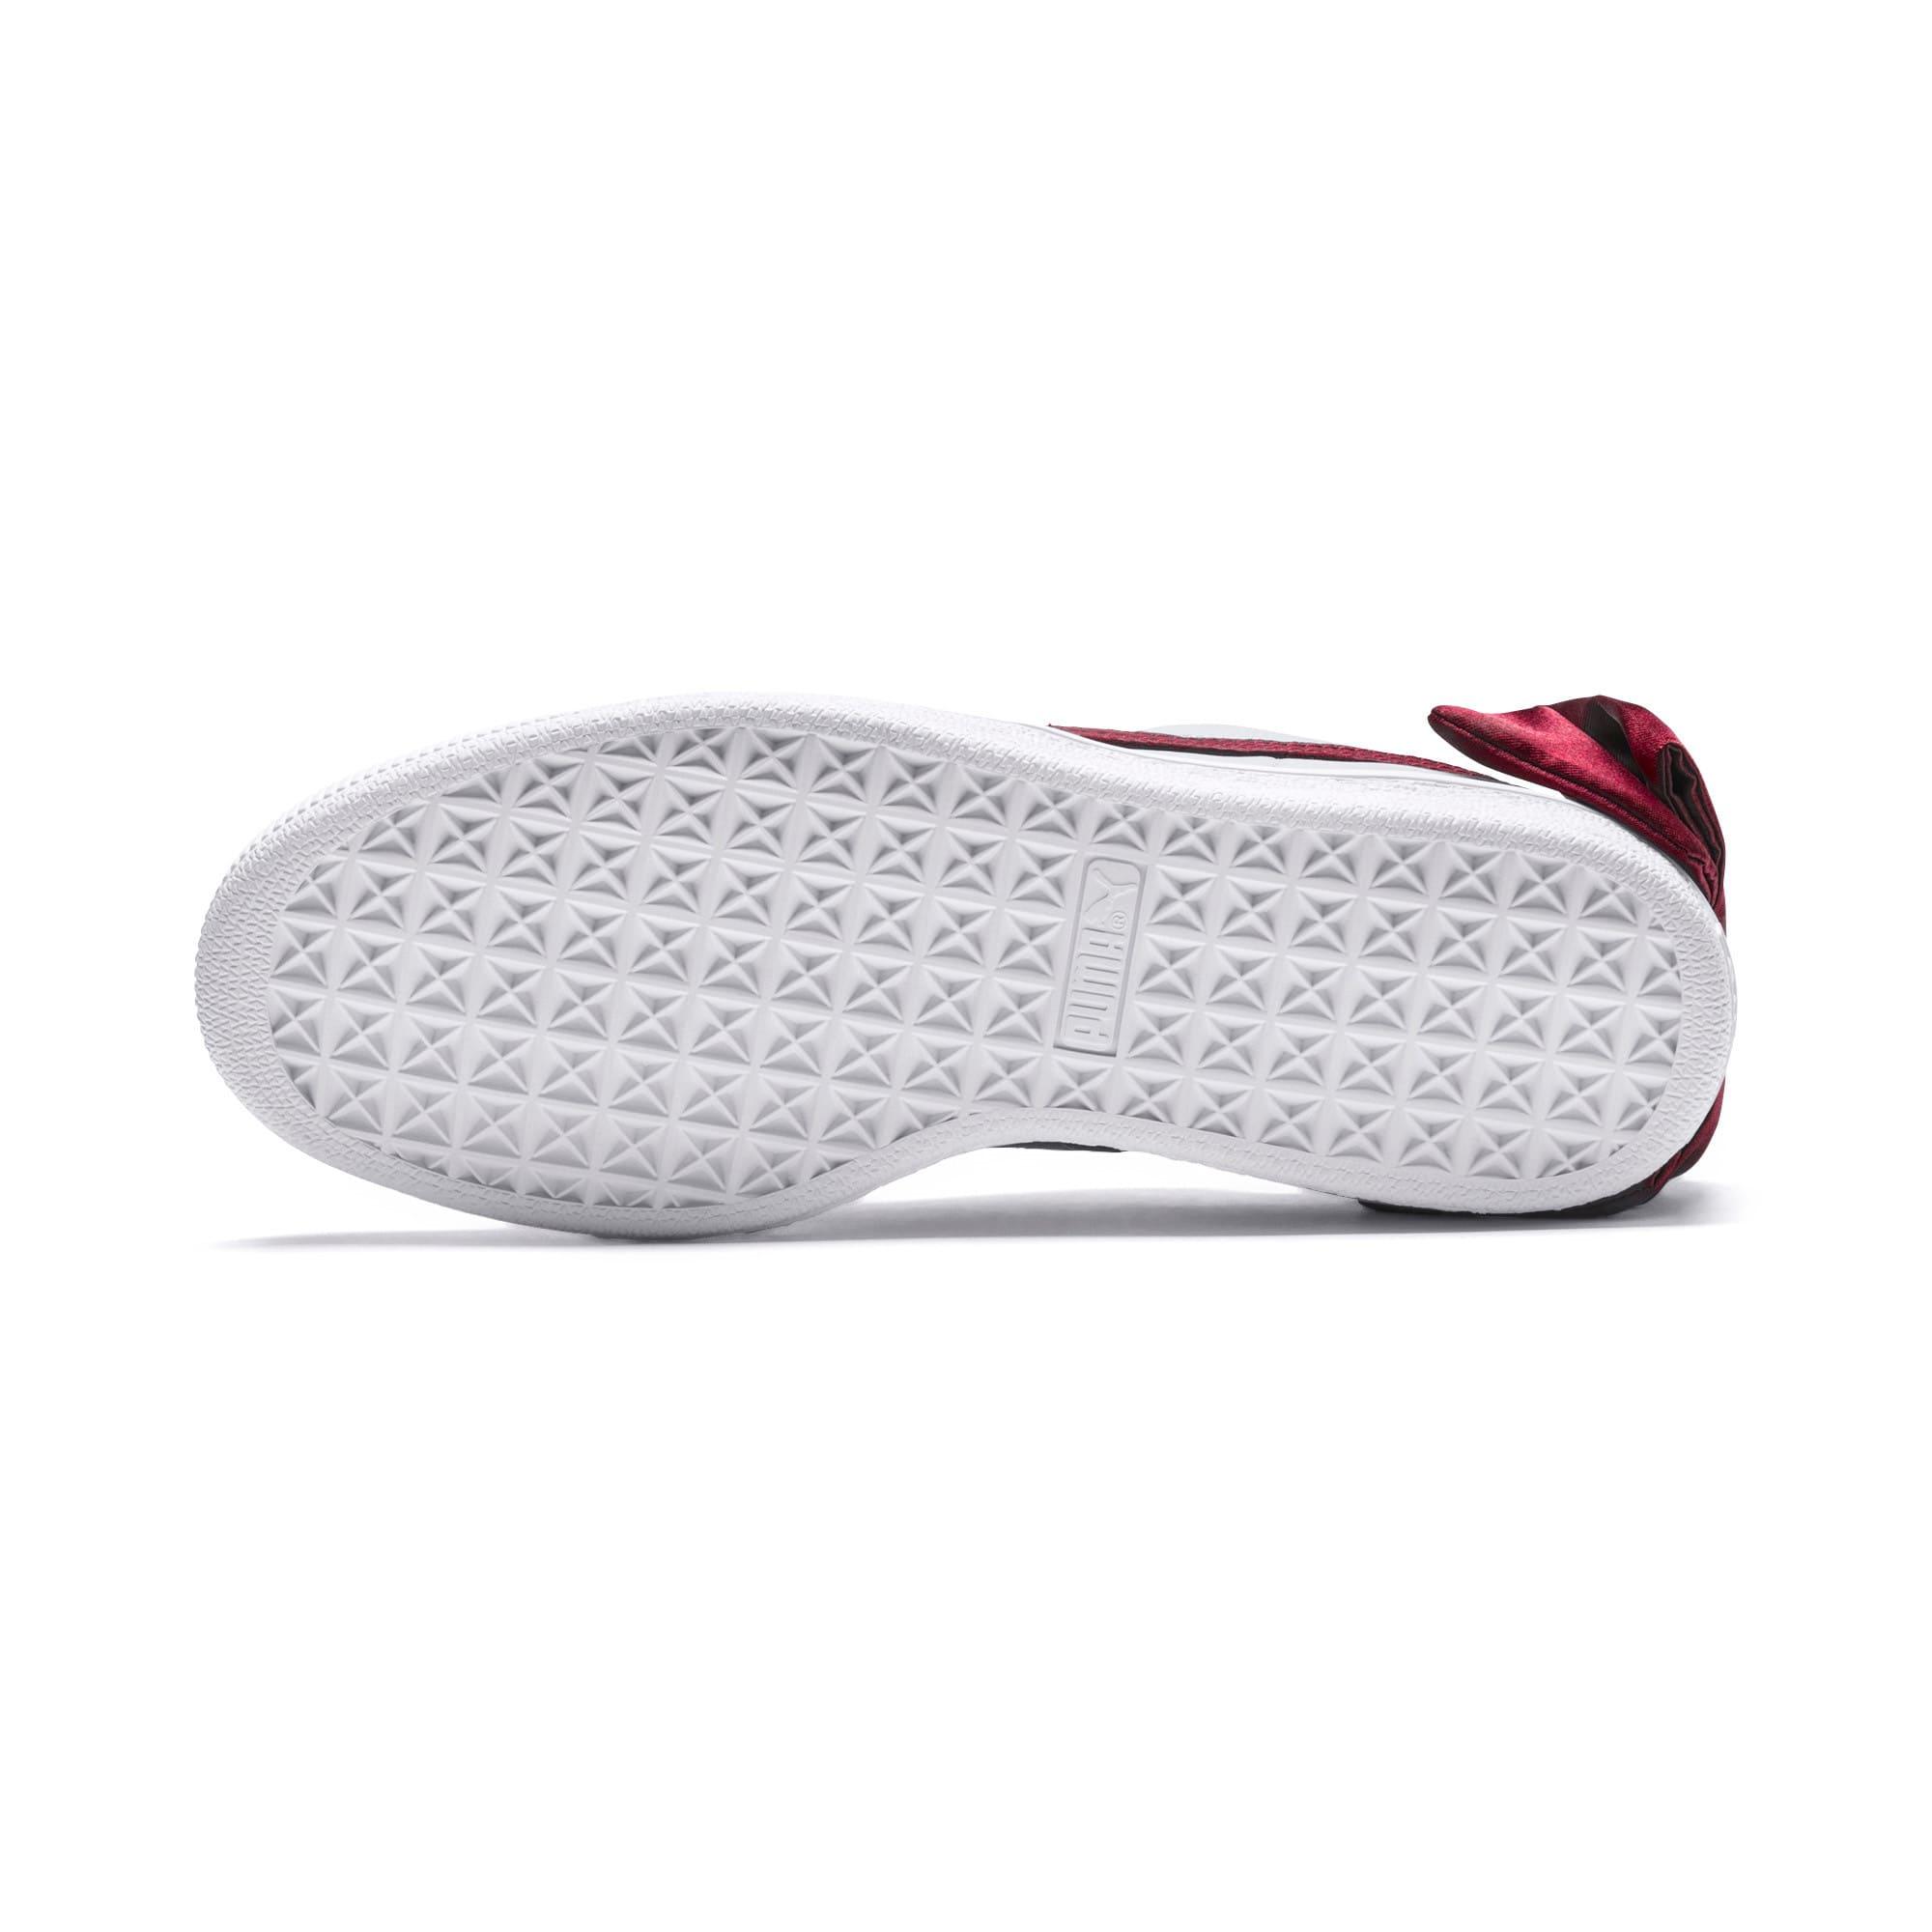 Thumbnail 3 of Basket Bow New School Women's Sneakers, P.White-CERULEAN-Pomegranate, medium